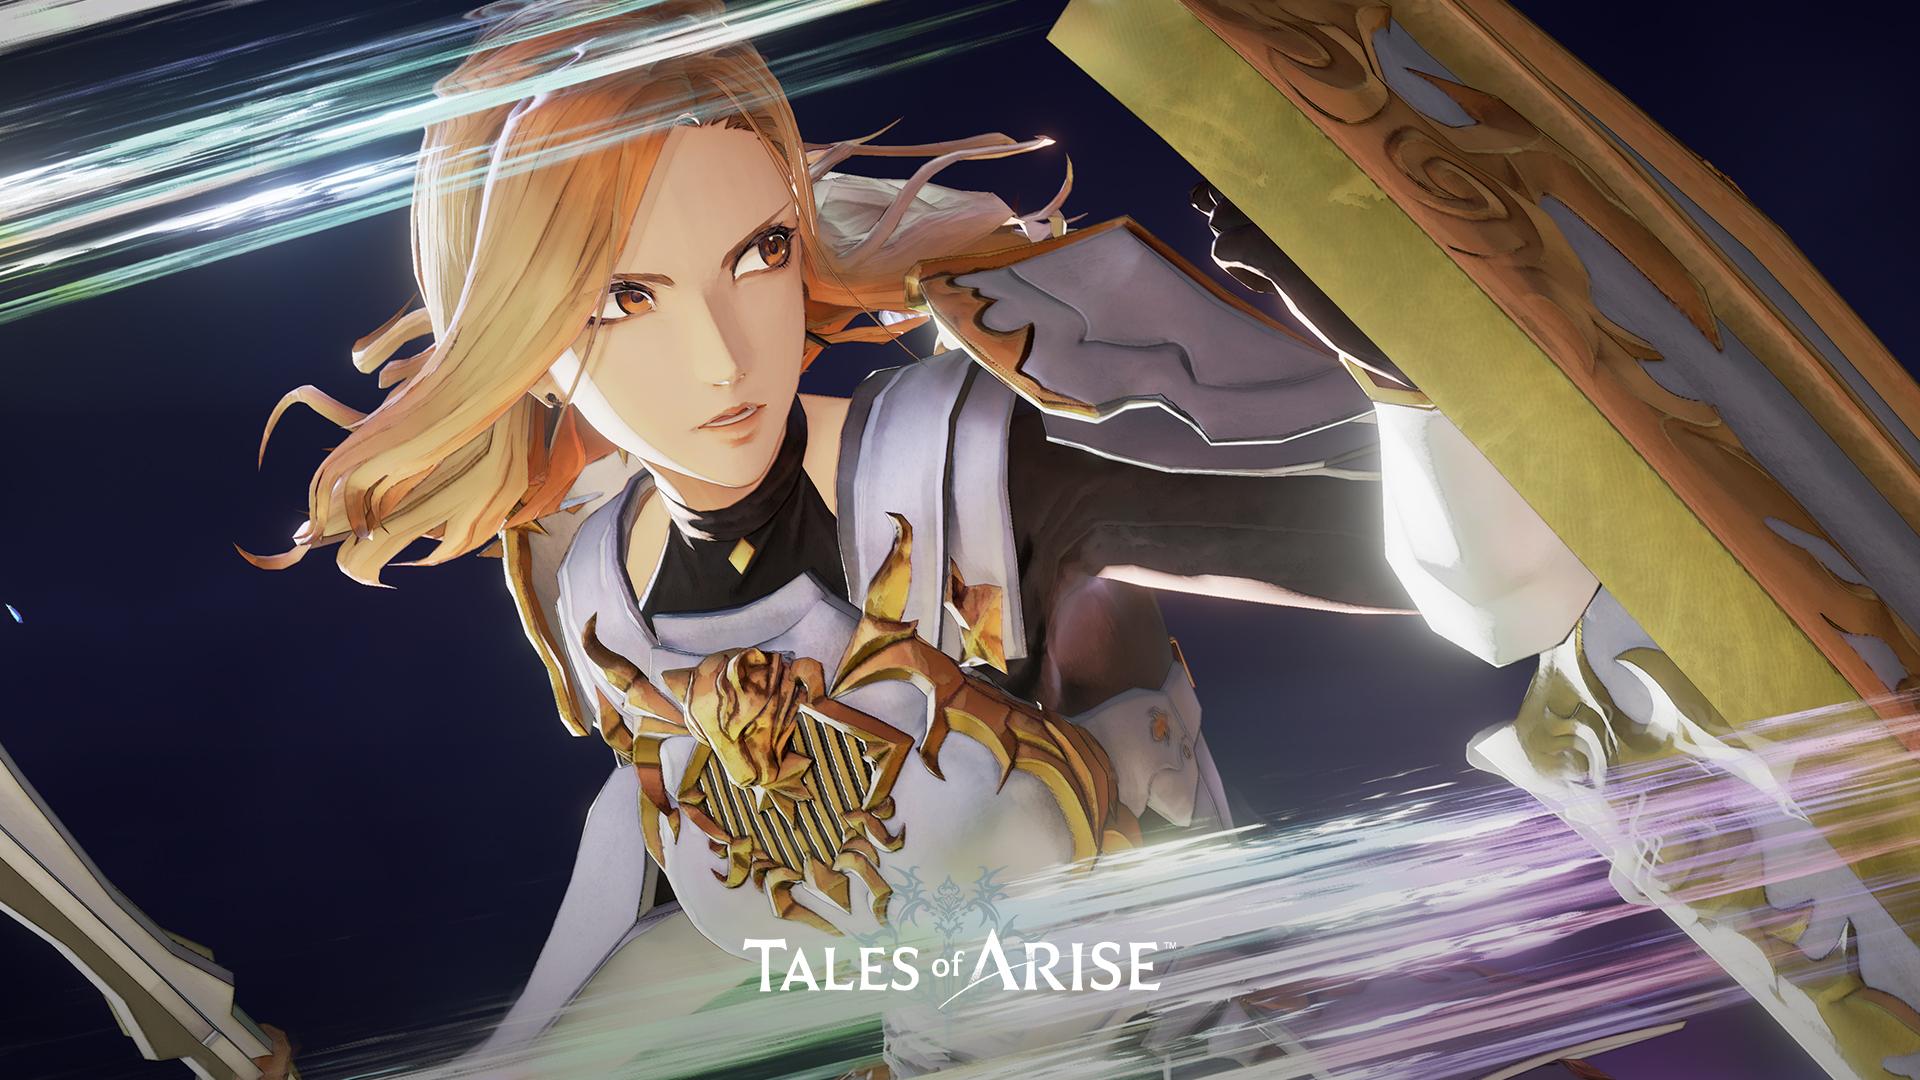 tales of arise kisara preview 4